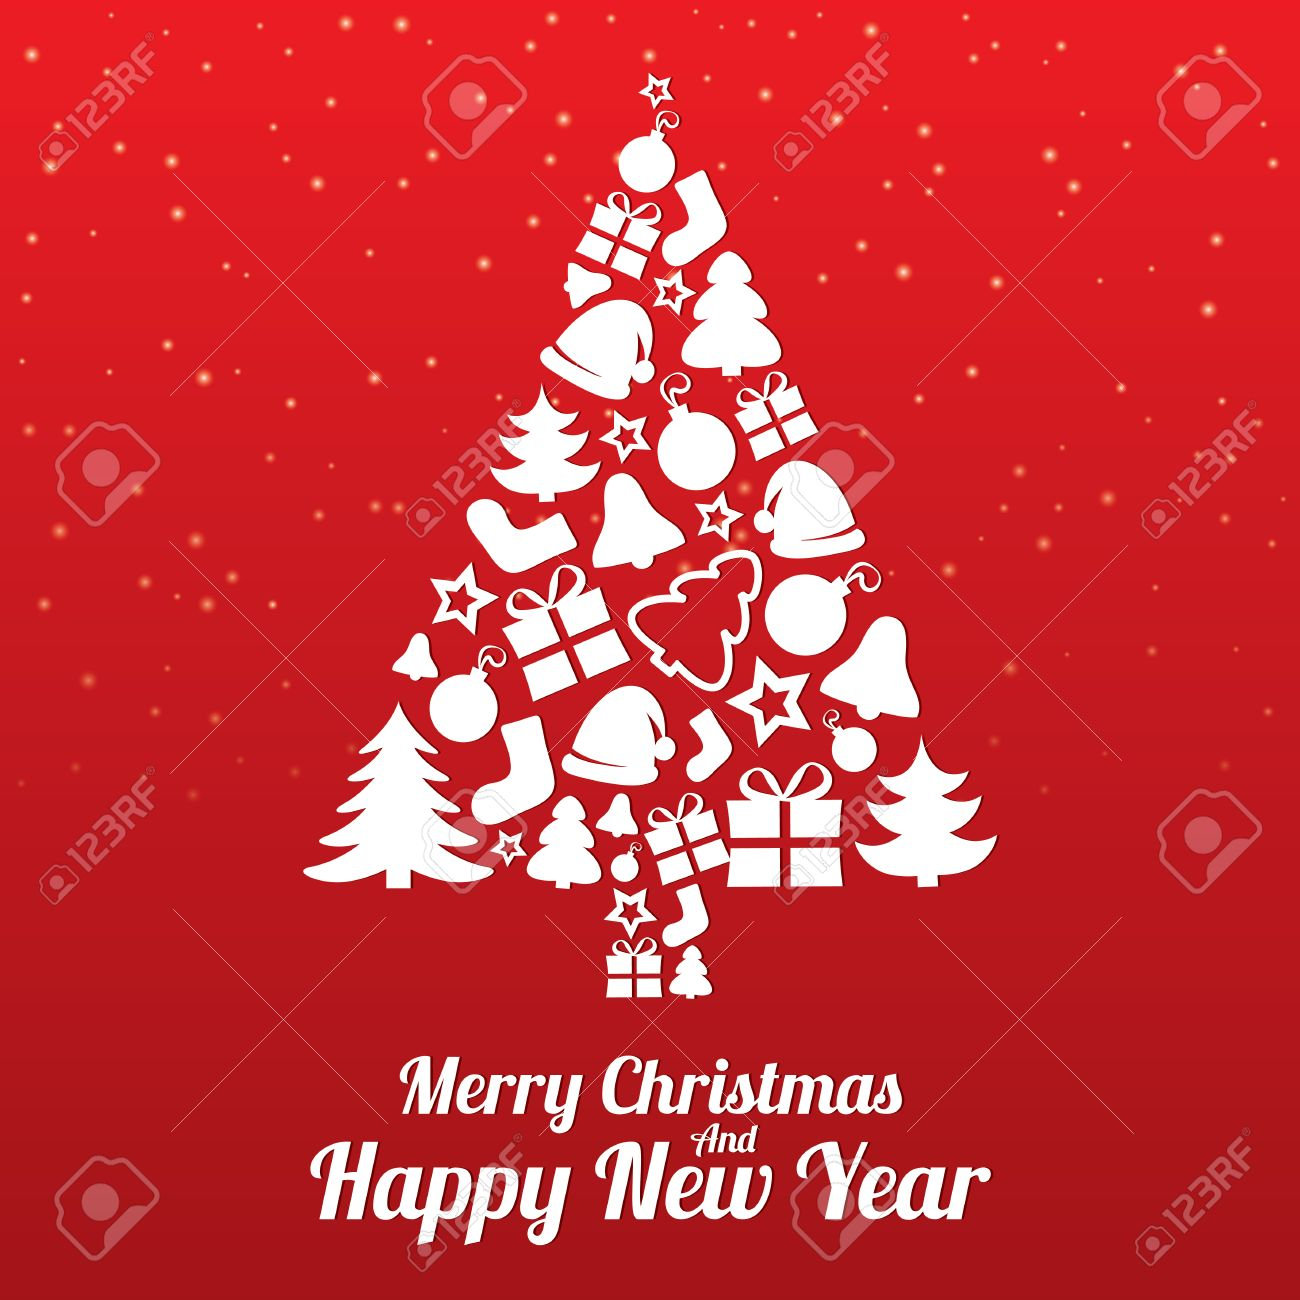 Merry Christmas Greeting Card Christmas Tree Of Flat Icons Stock